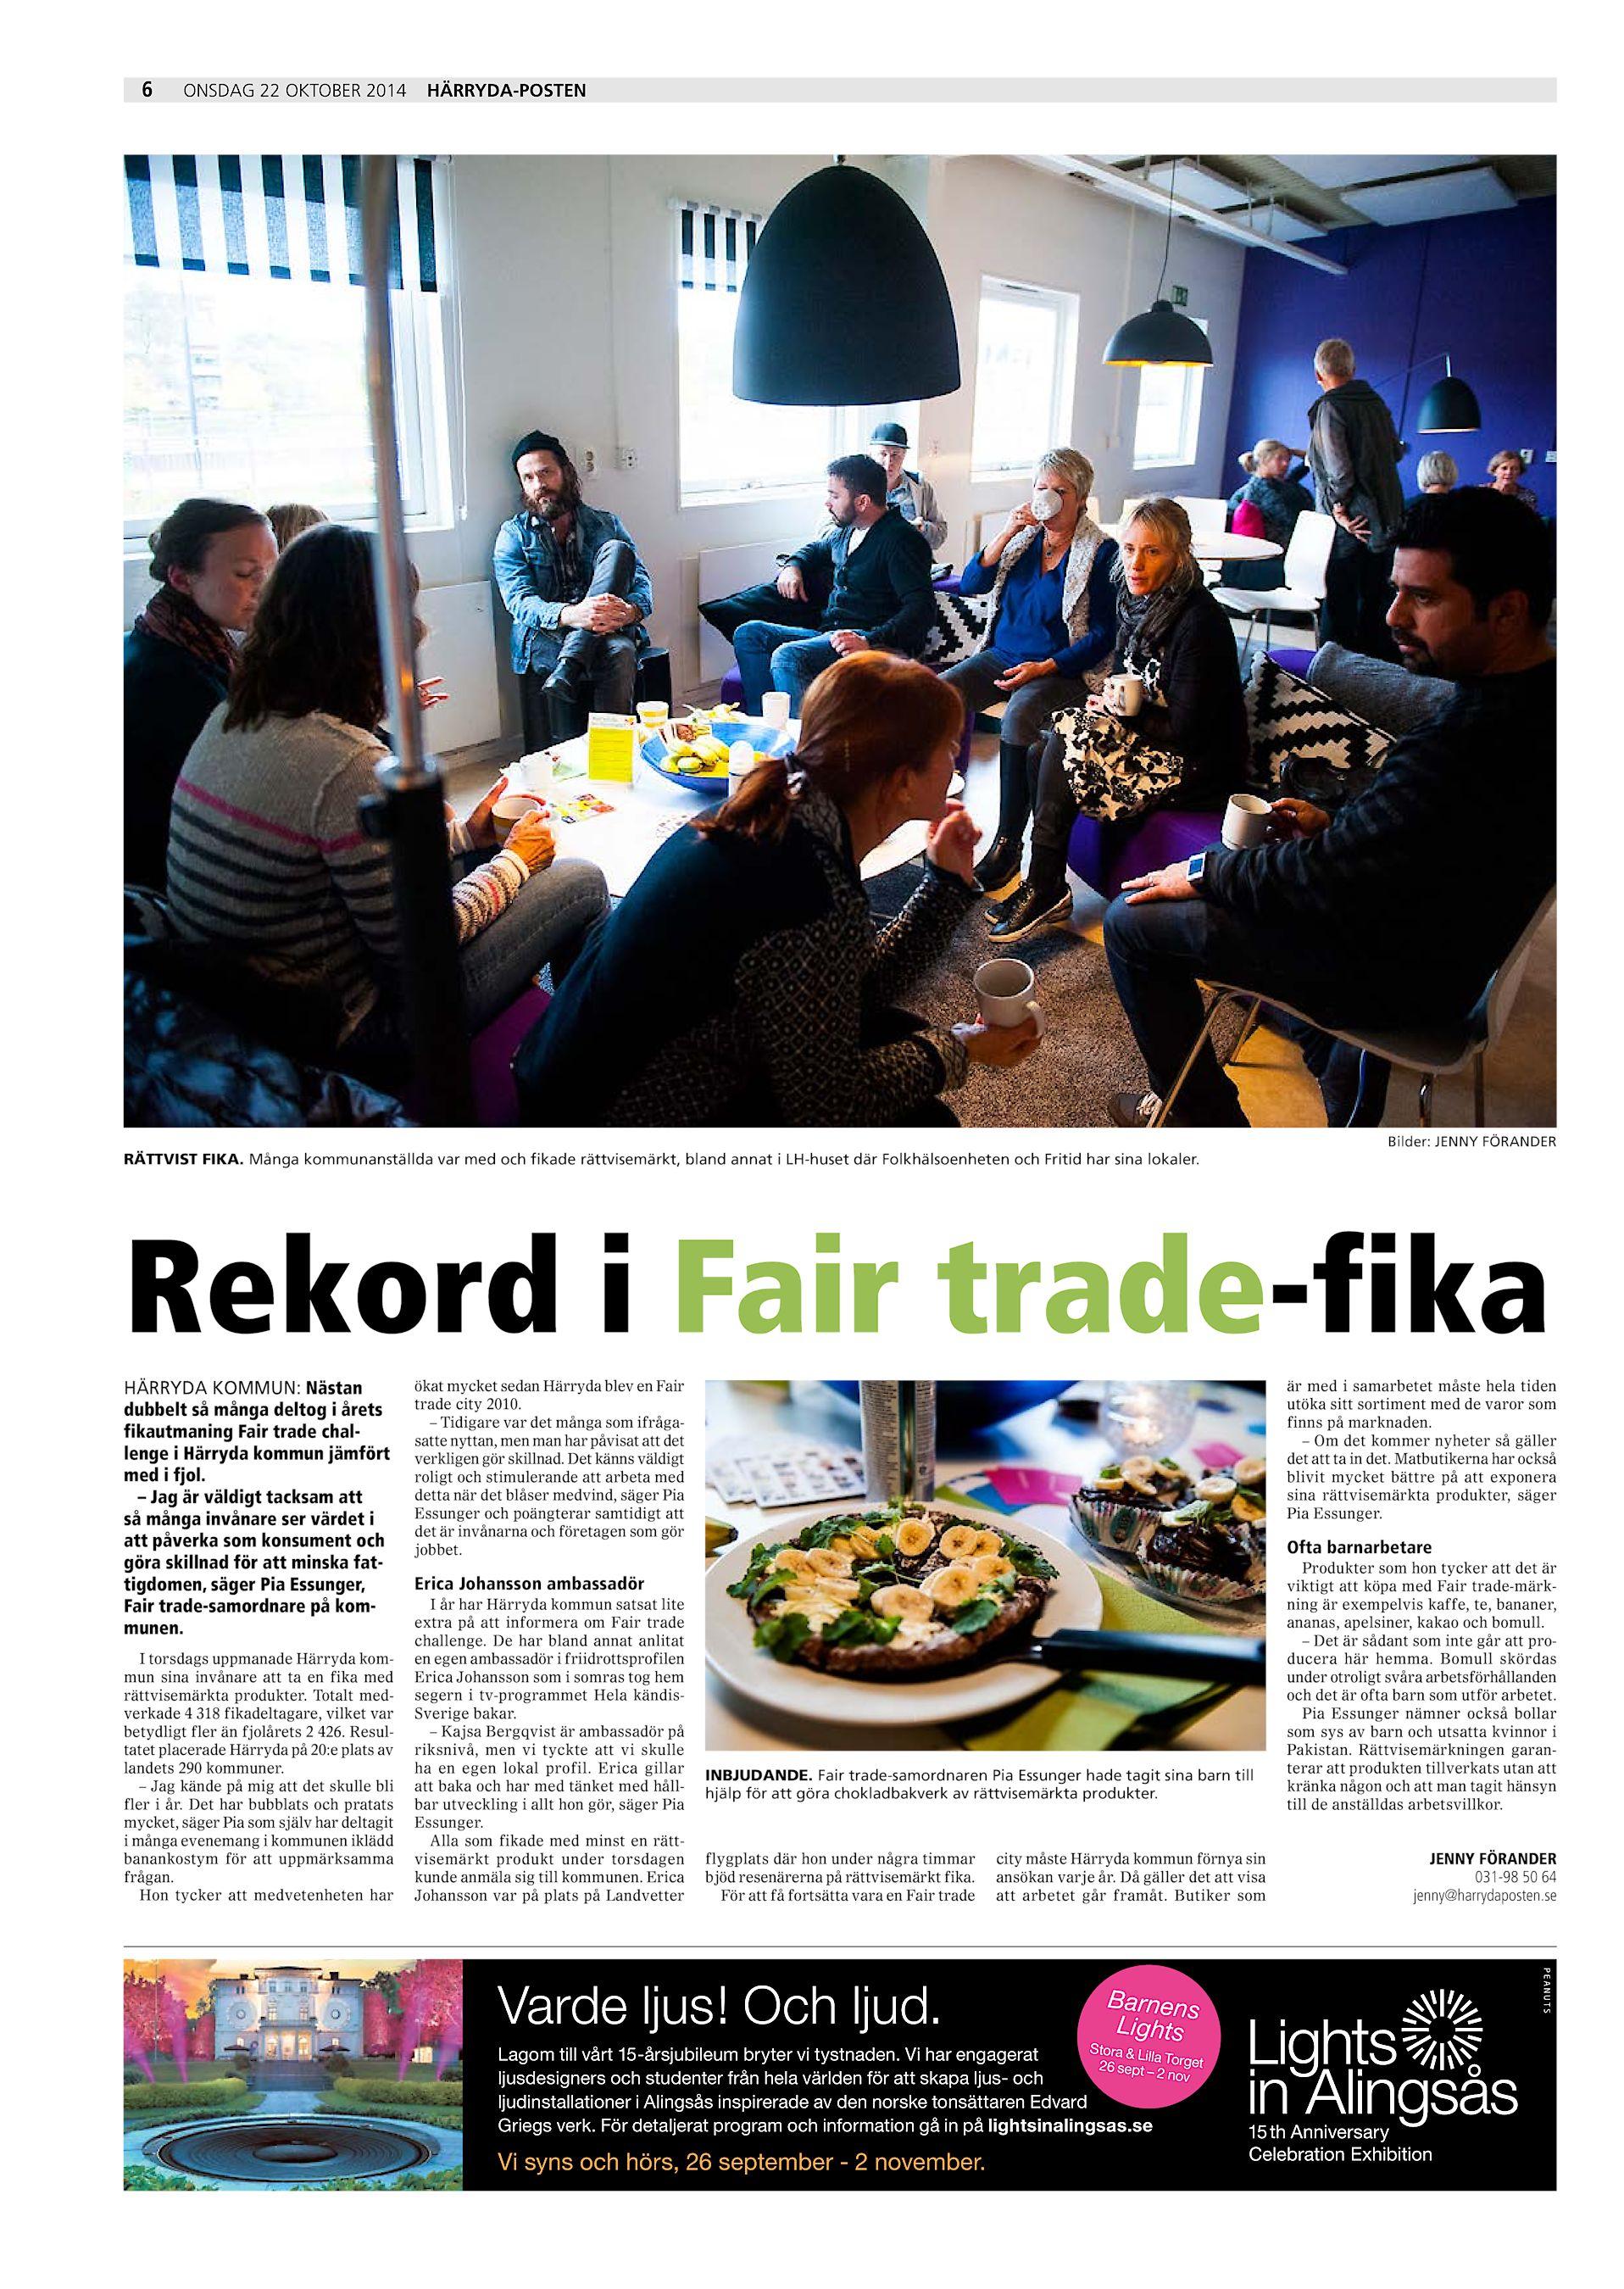 Härrydaposten   Partille Tidning HP-2014-10-22 (endast text) 4141bc42ce9b8